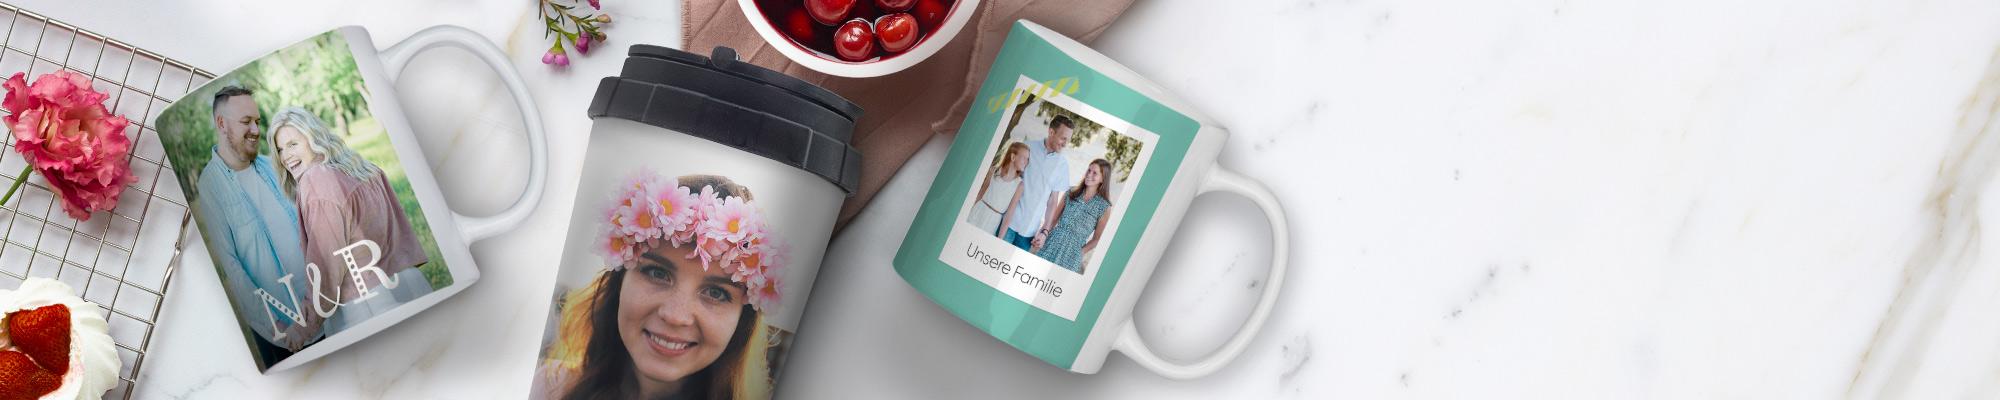 Selbst gestaltete Fototassen